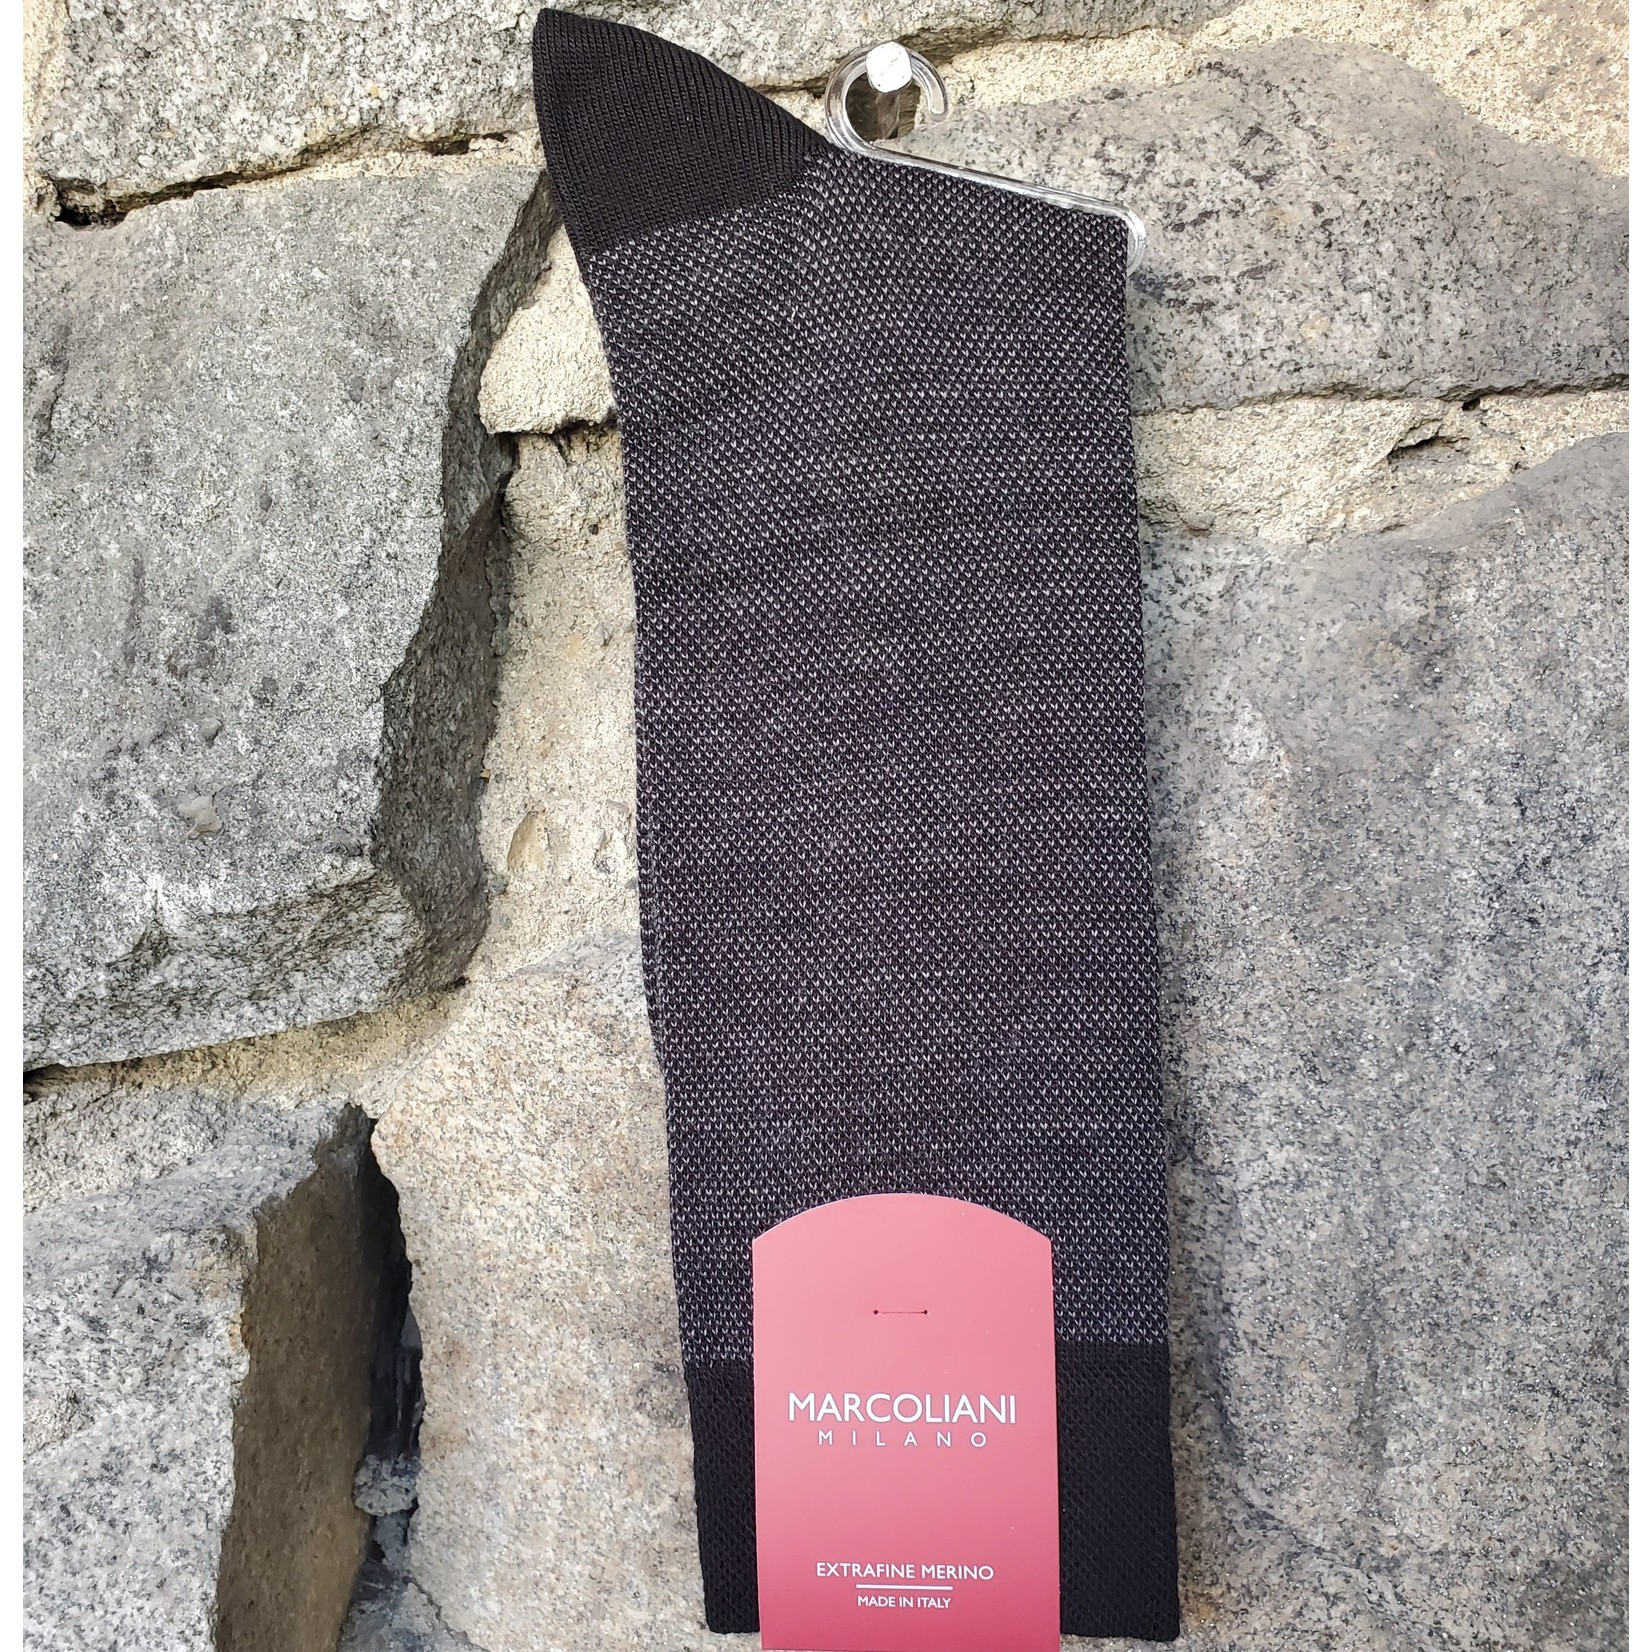 Marcoliani Marcoliani Extrafine Merino Socks - Black Birdseye